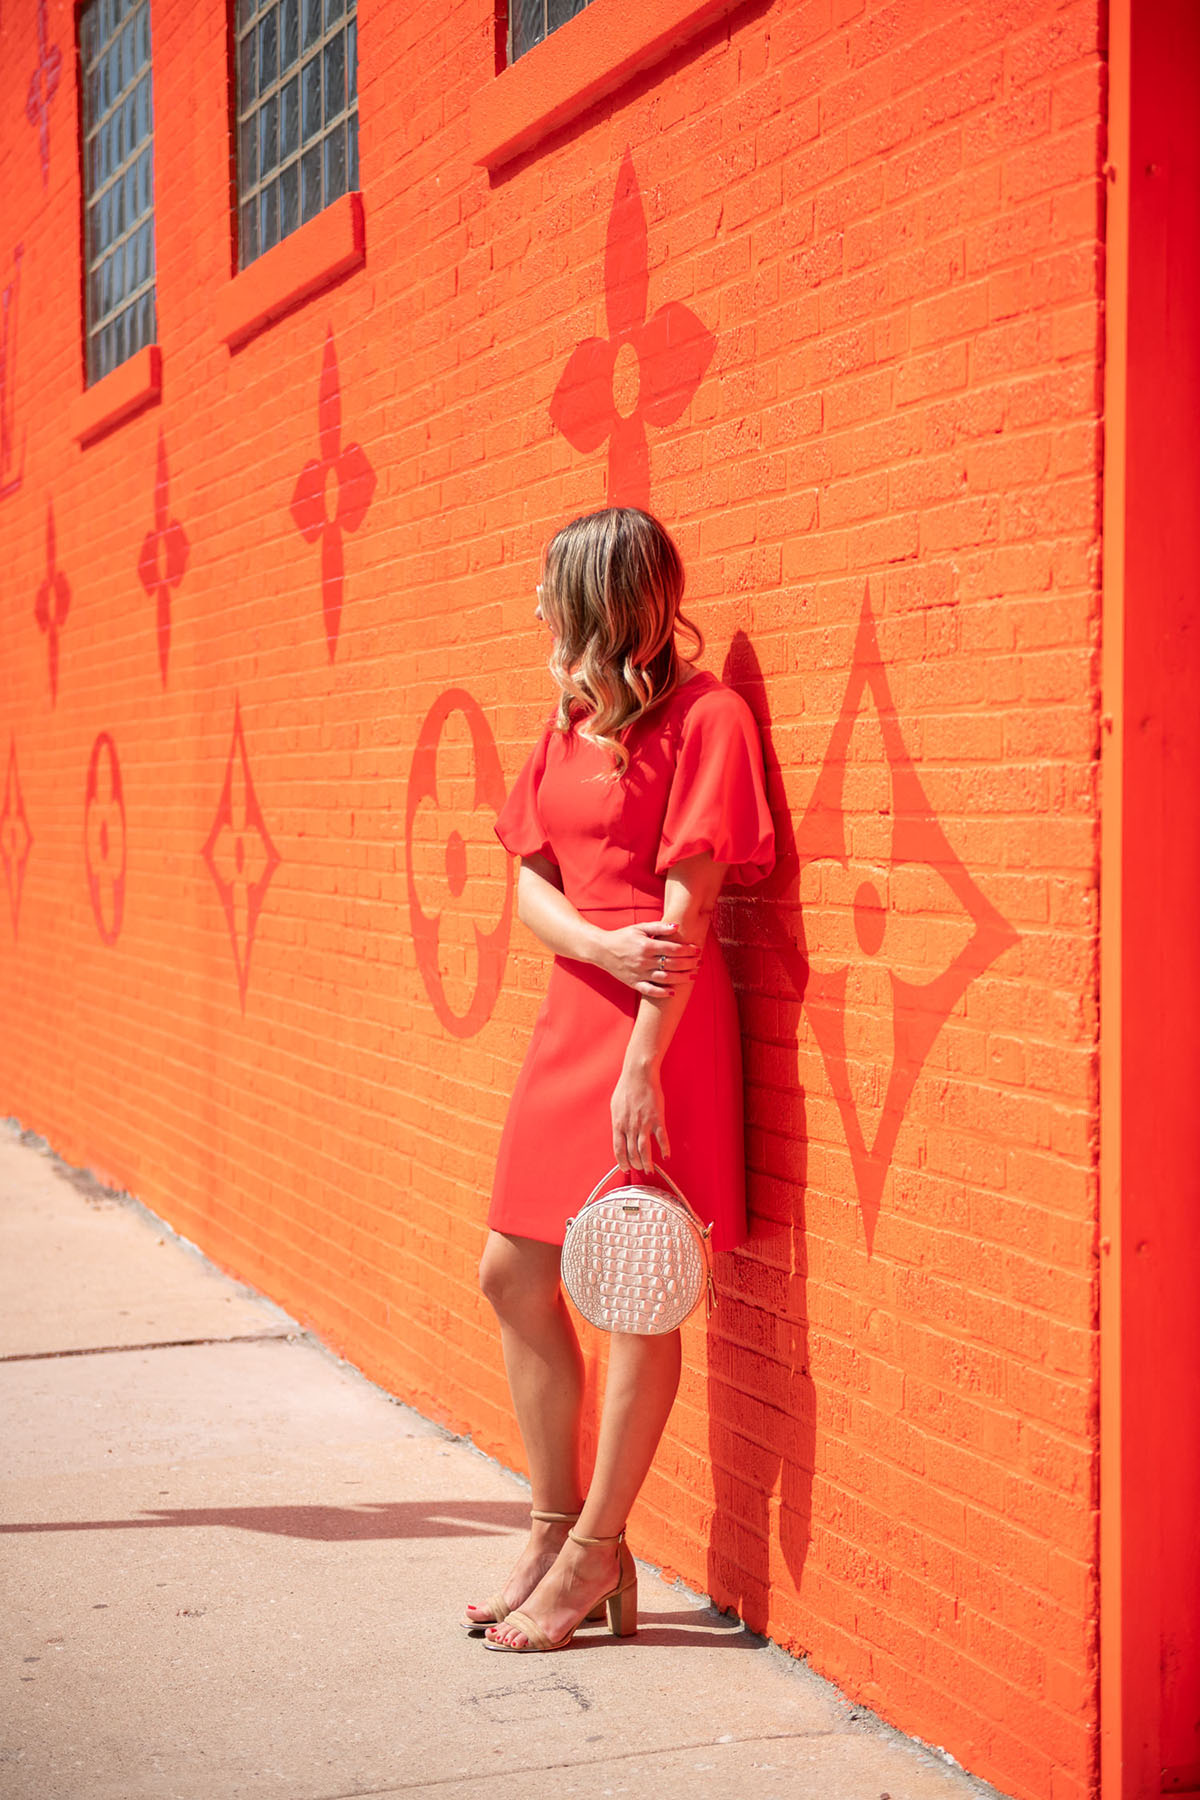 louis vuitton orange wall chicago — bows & sequins